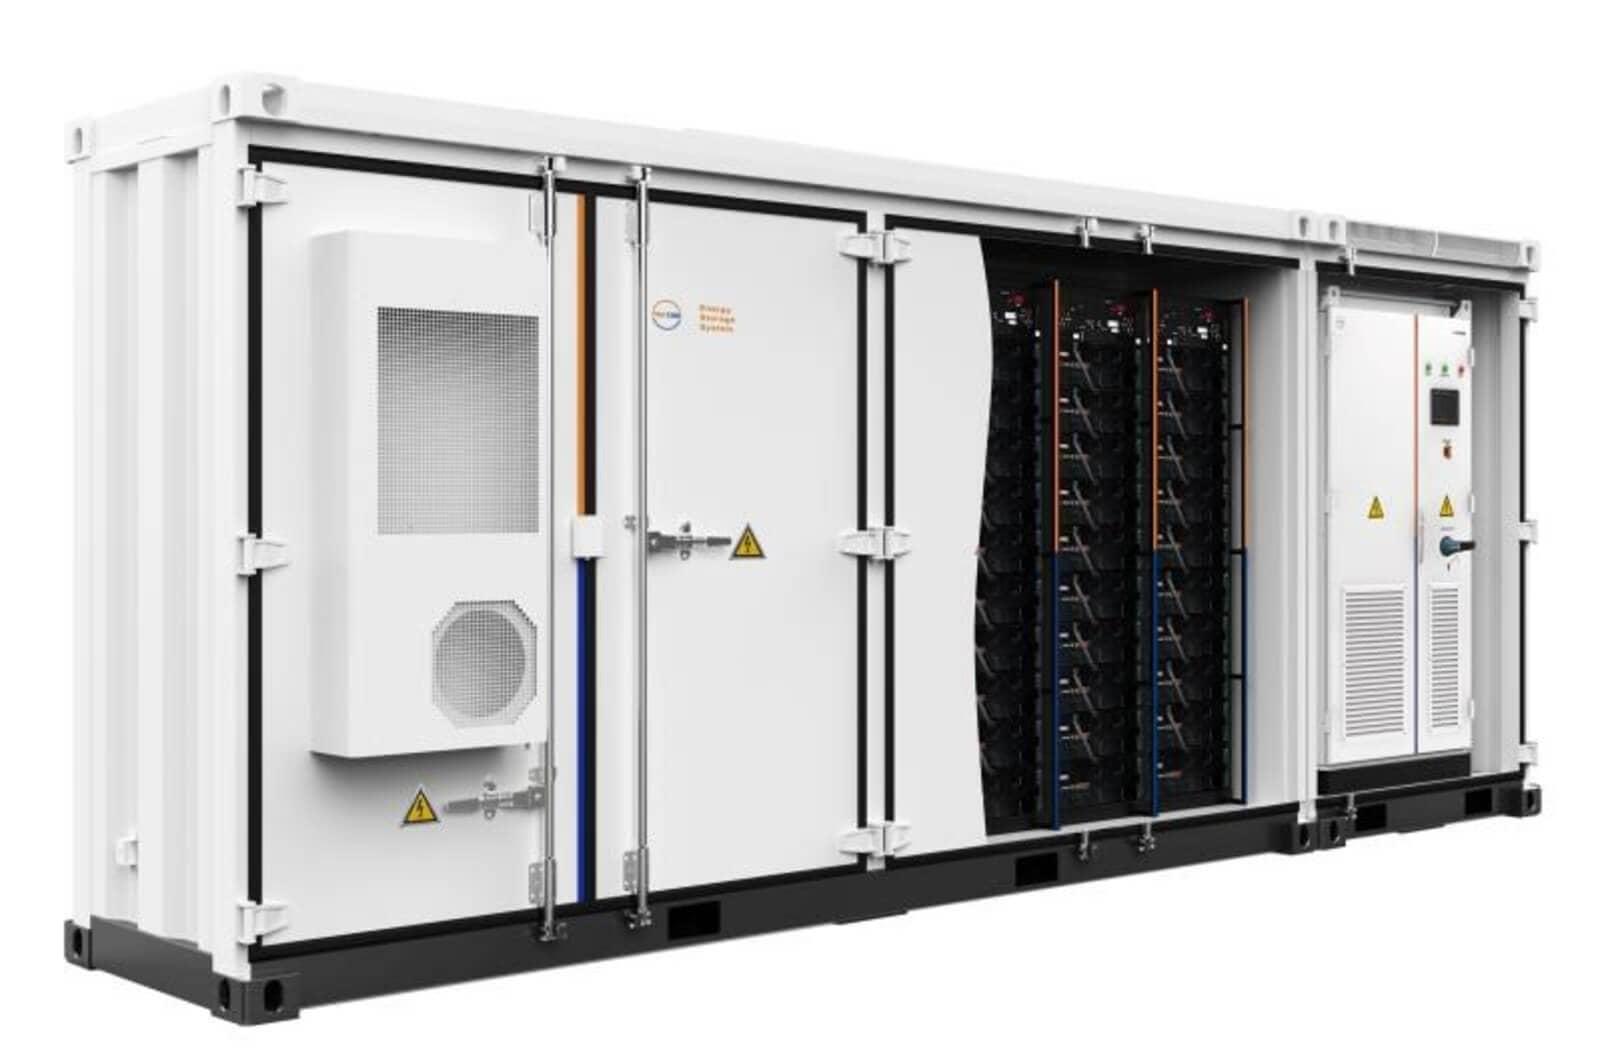 Sungrow Sungrow Introduces C&I Storage Solution For North America